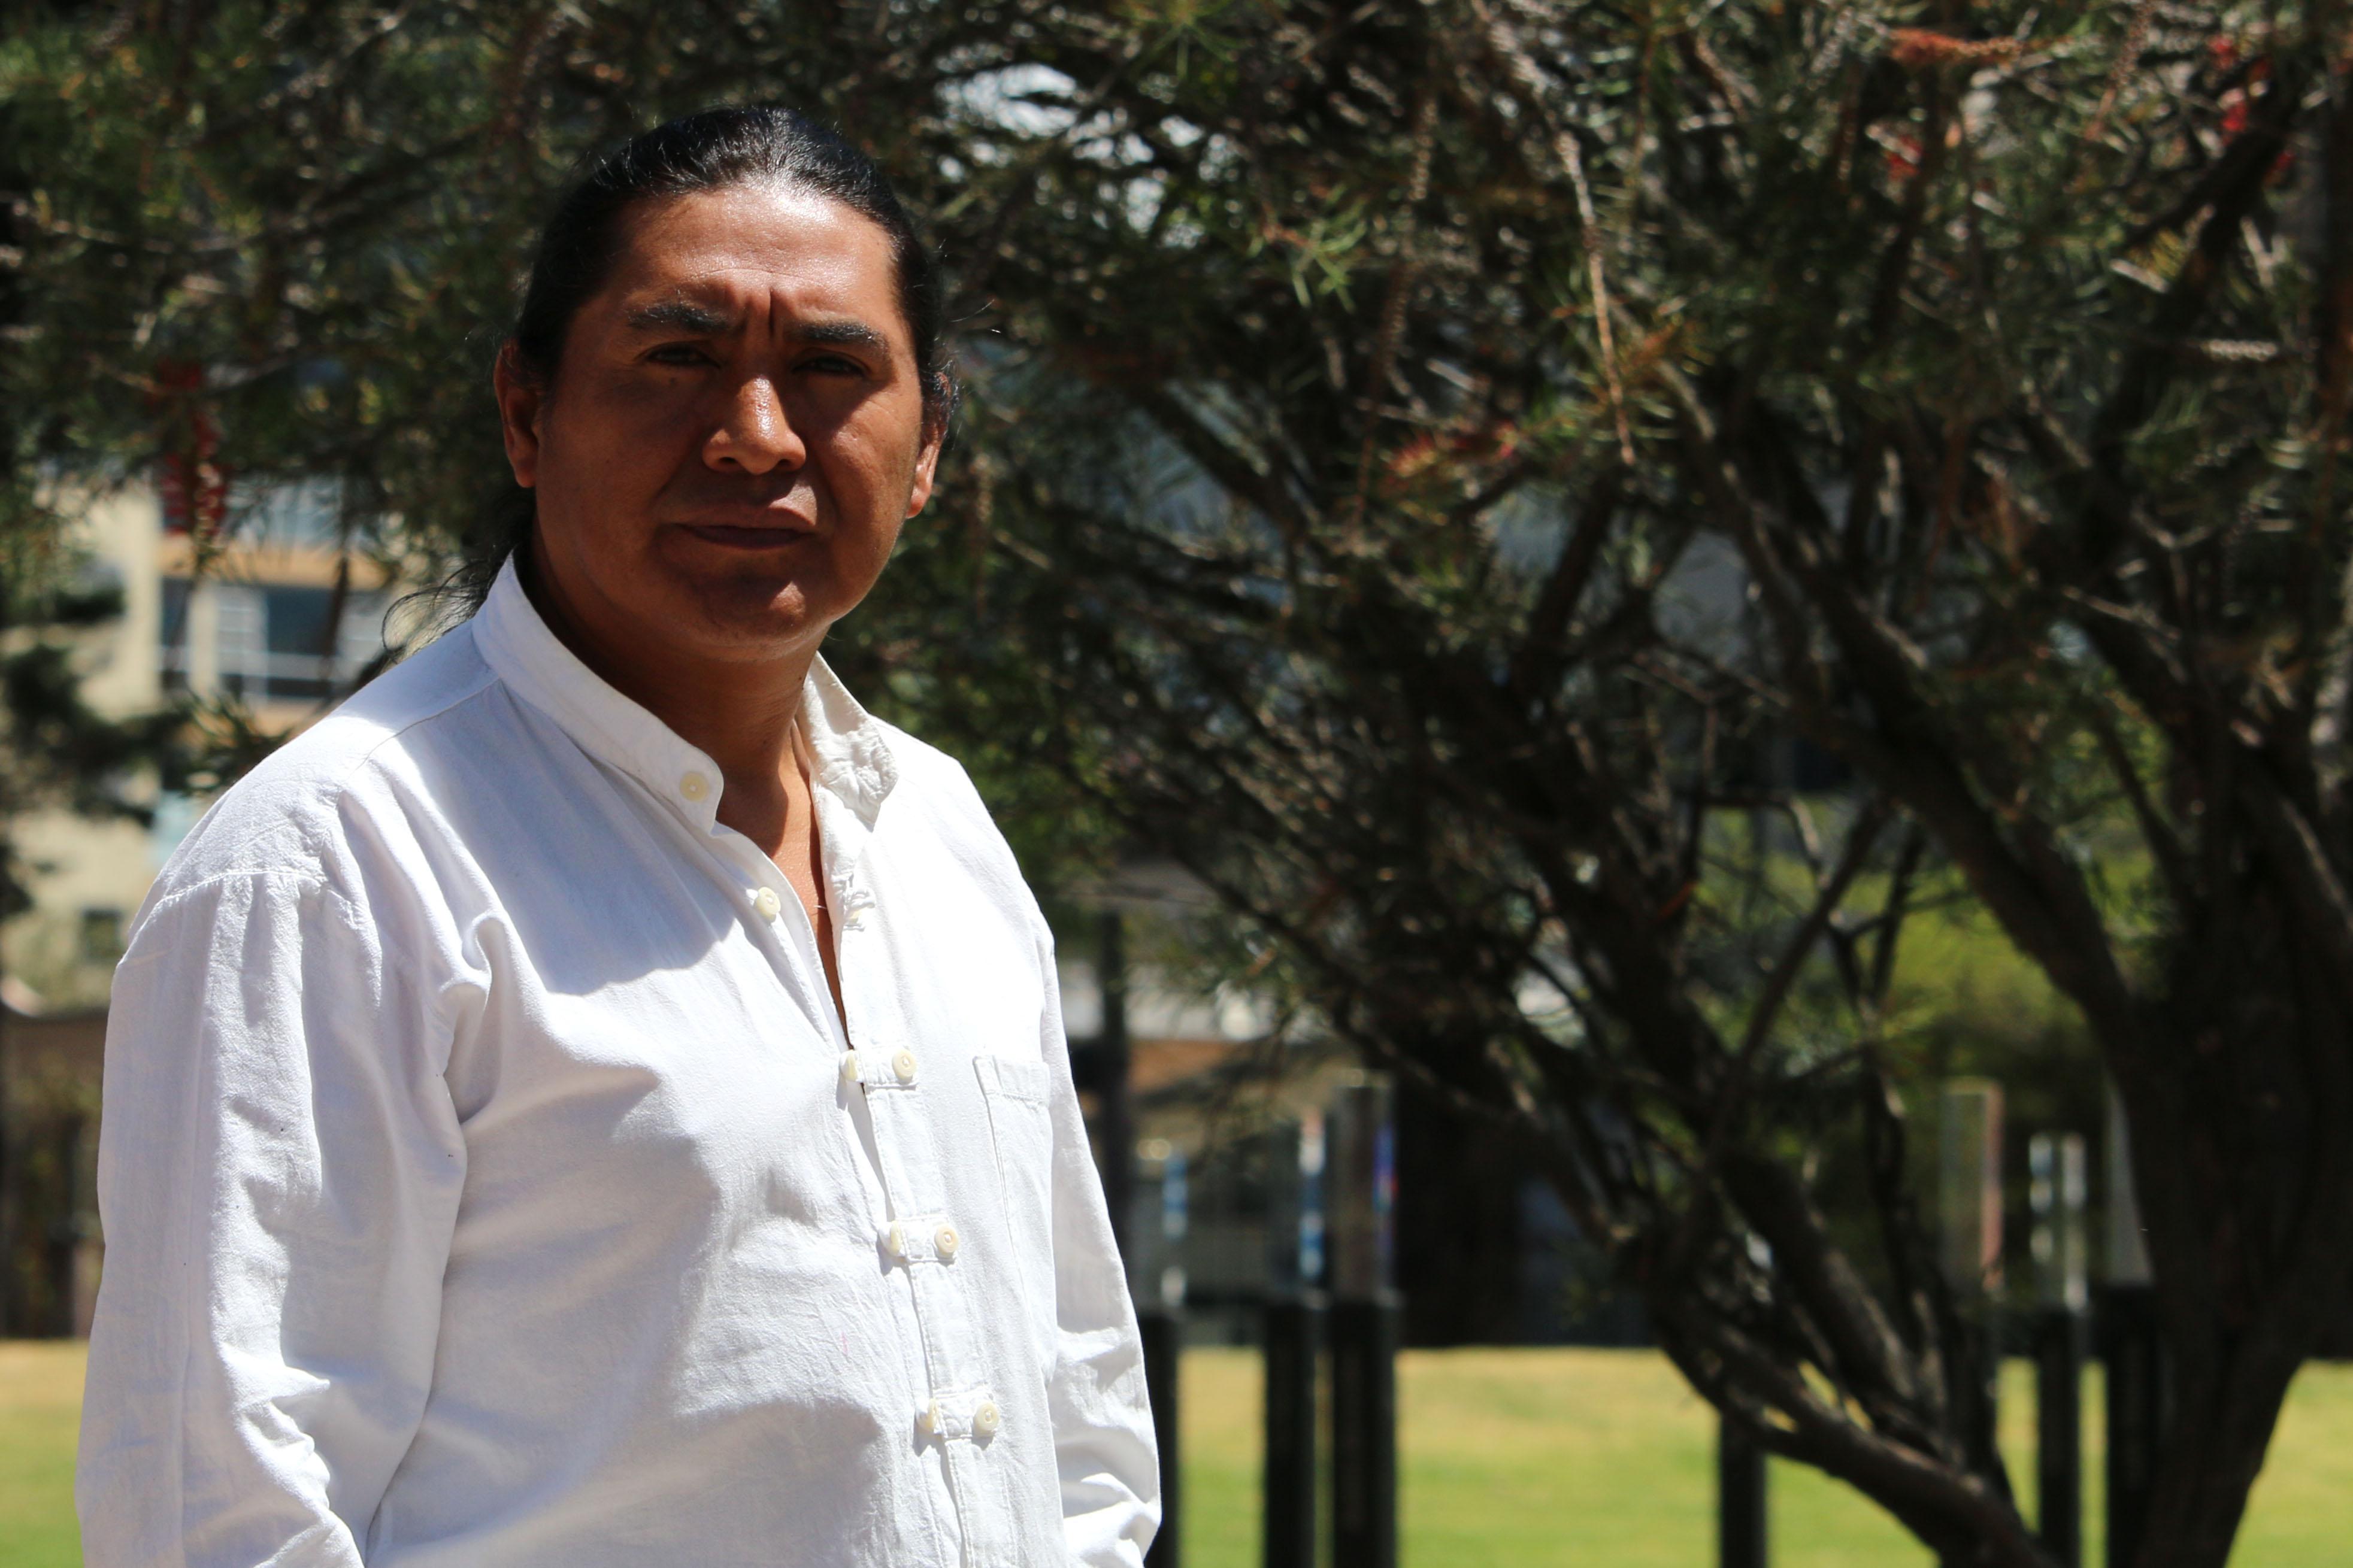 Cristóbal Ortega Maila